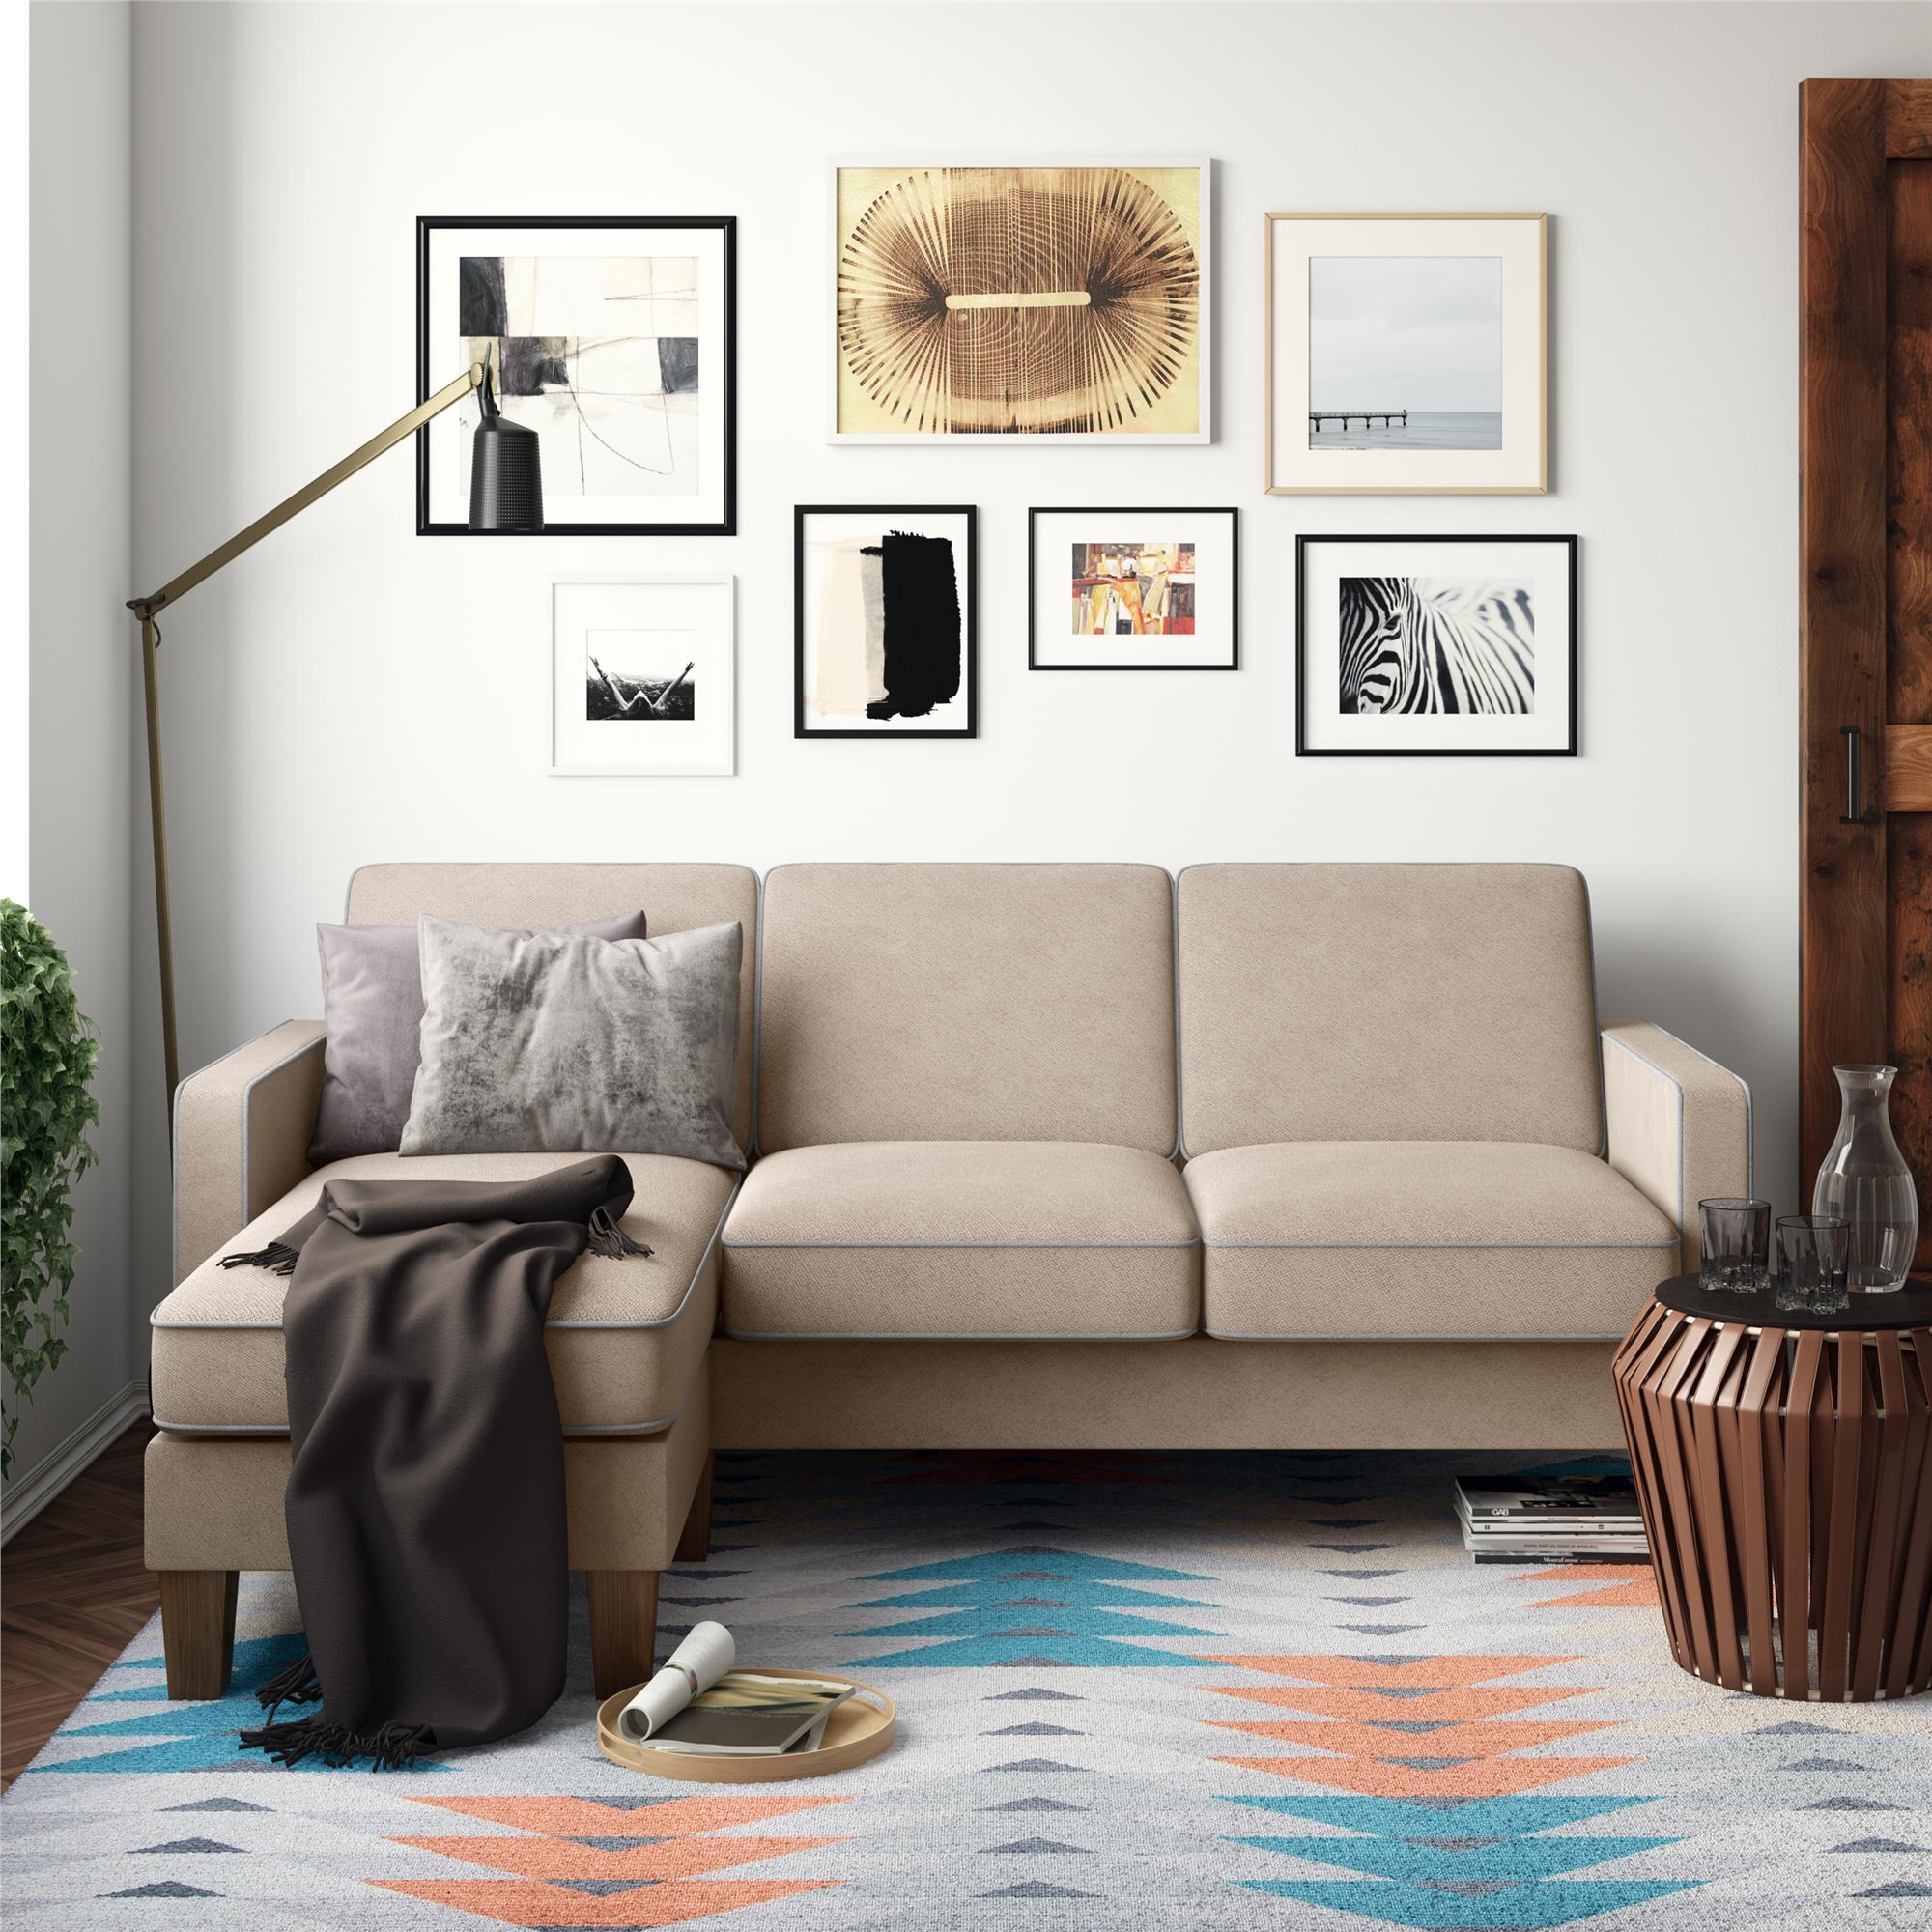 Novogratz Bowen Sectional Sofa with Contrast Welting, Blue